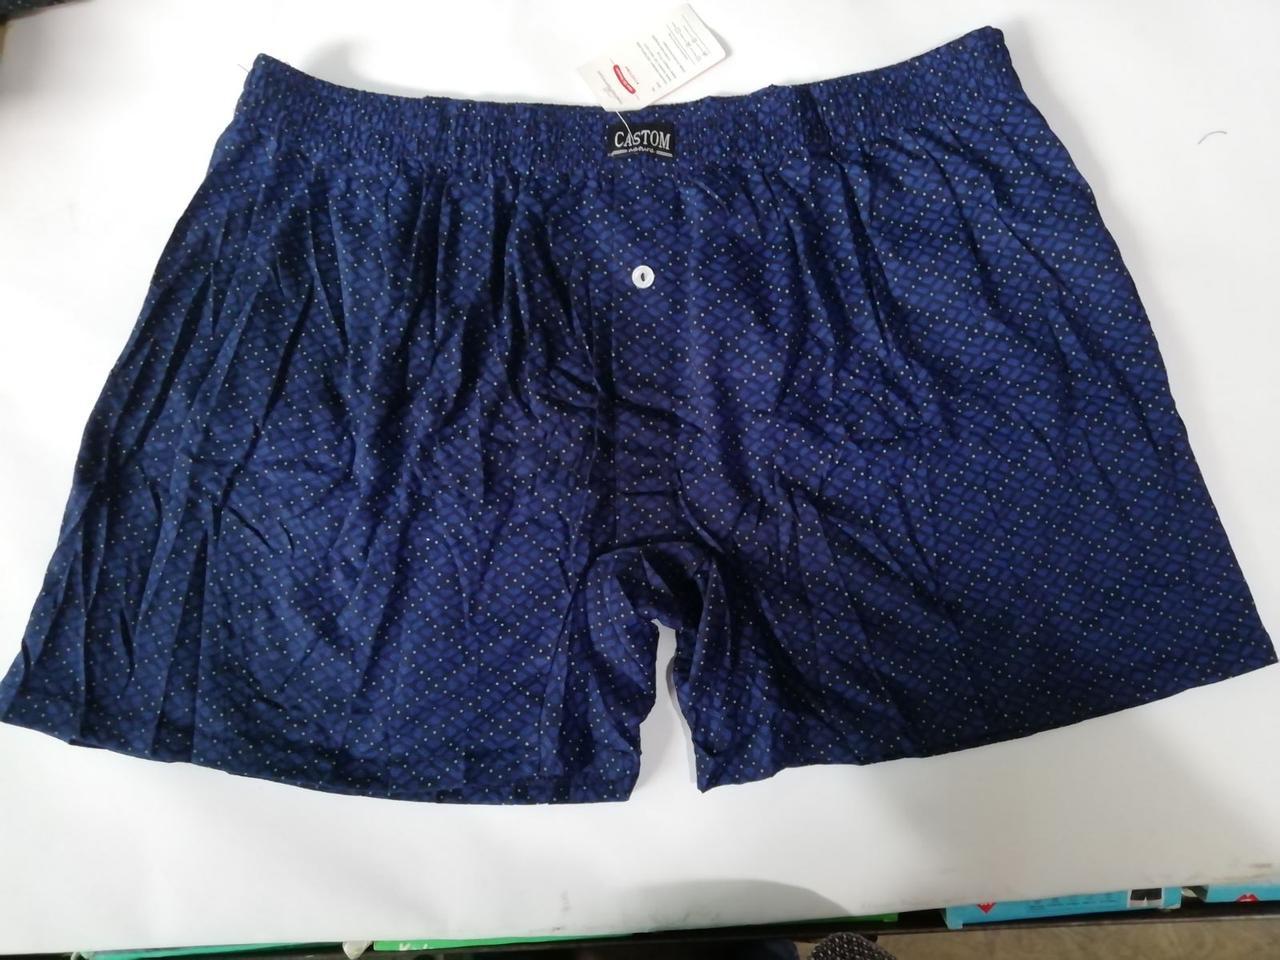 Мужские трусы шорты (семейные трусы батал 5,6,7) Марка «CASTOM»  арт.:58101